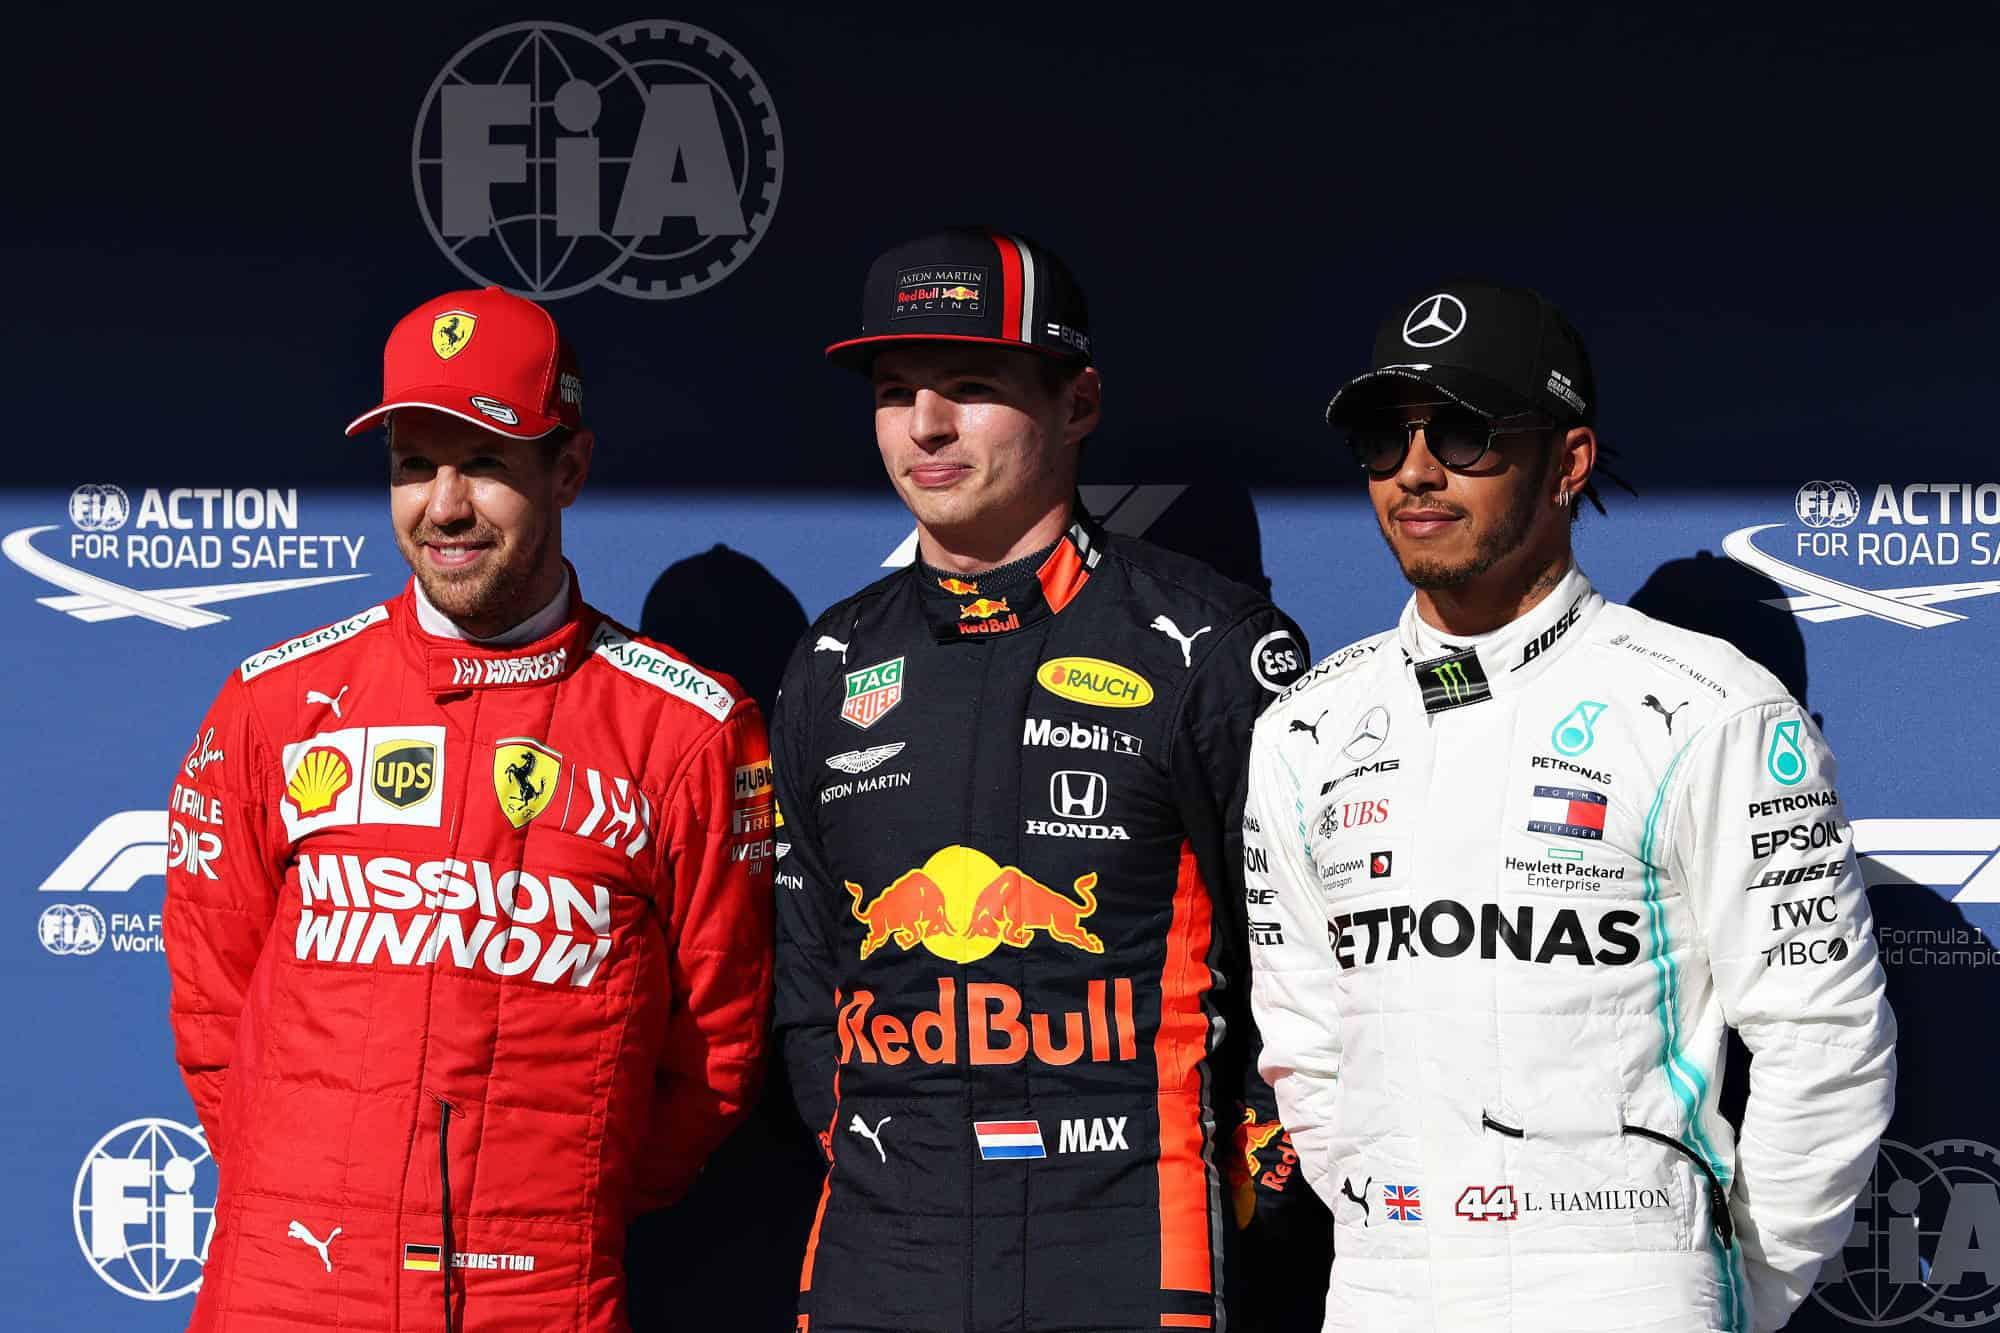 2019 Brazilian GP F1 Post Qualifying top three Verstappen Vettel Hamilton Photo Red Bull